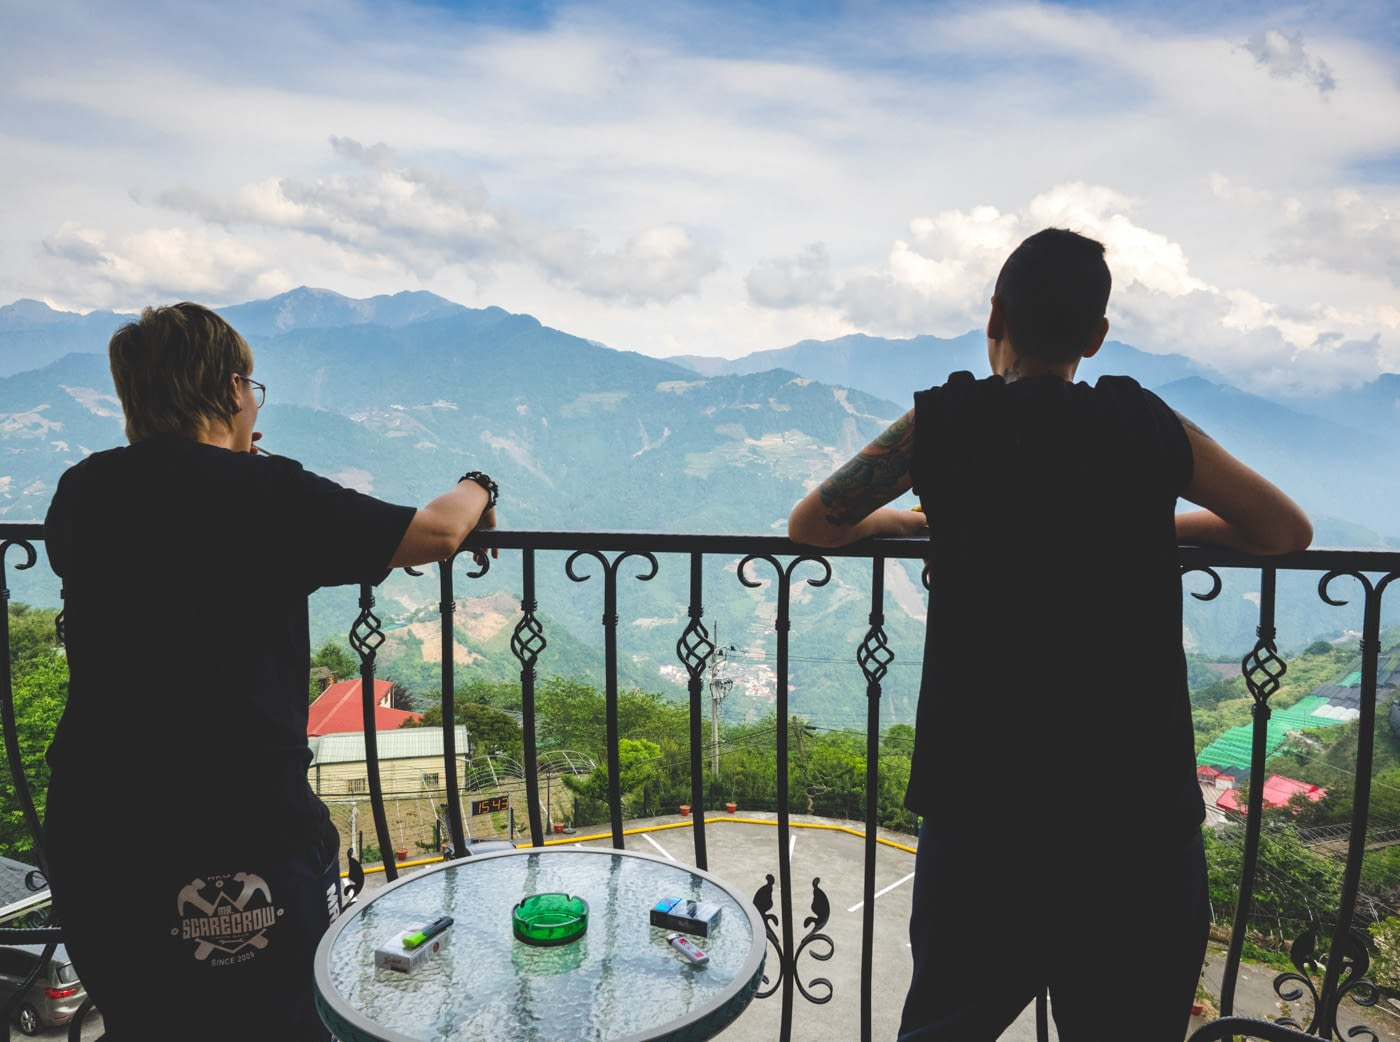 Taiwan - Qingjing - Balcony with a nice view